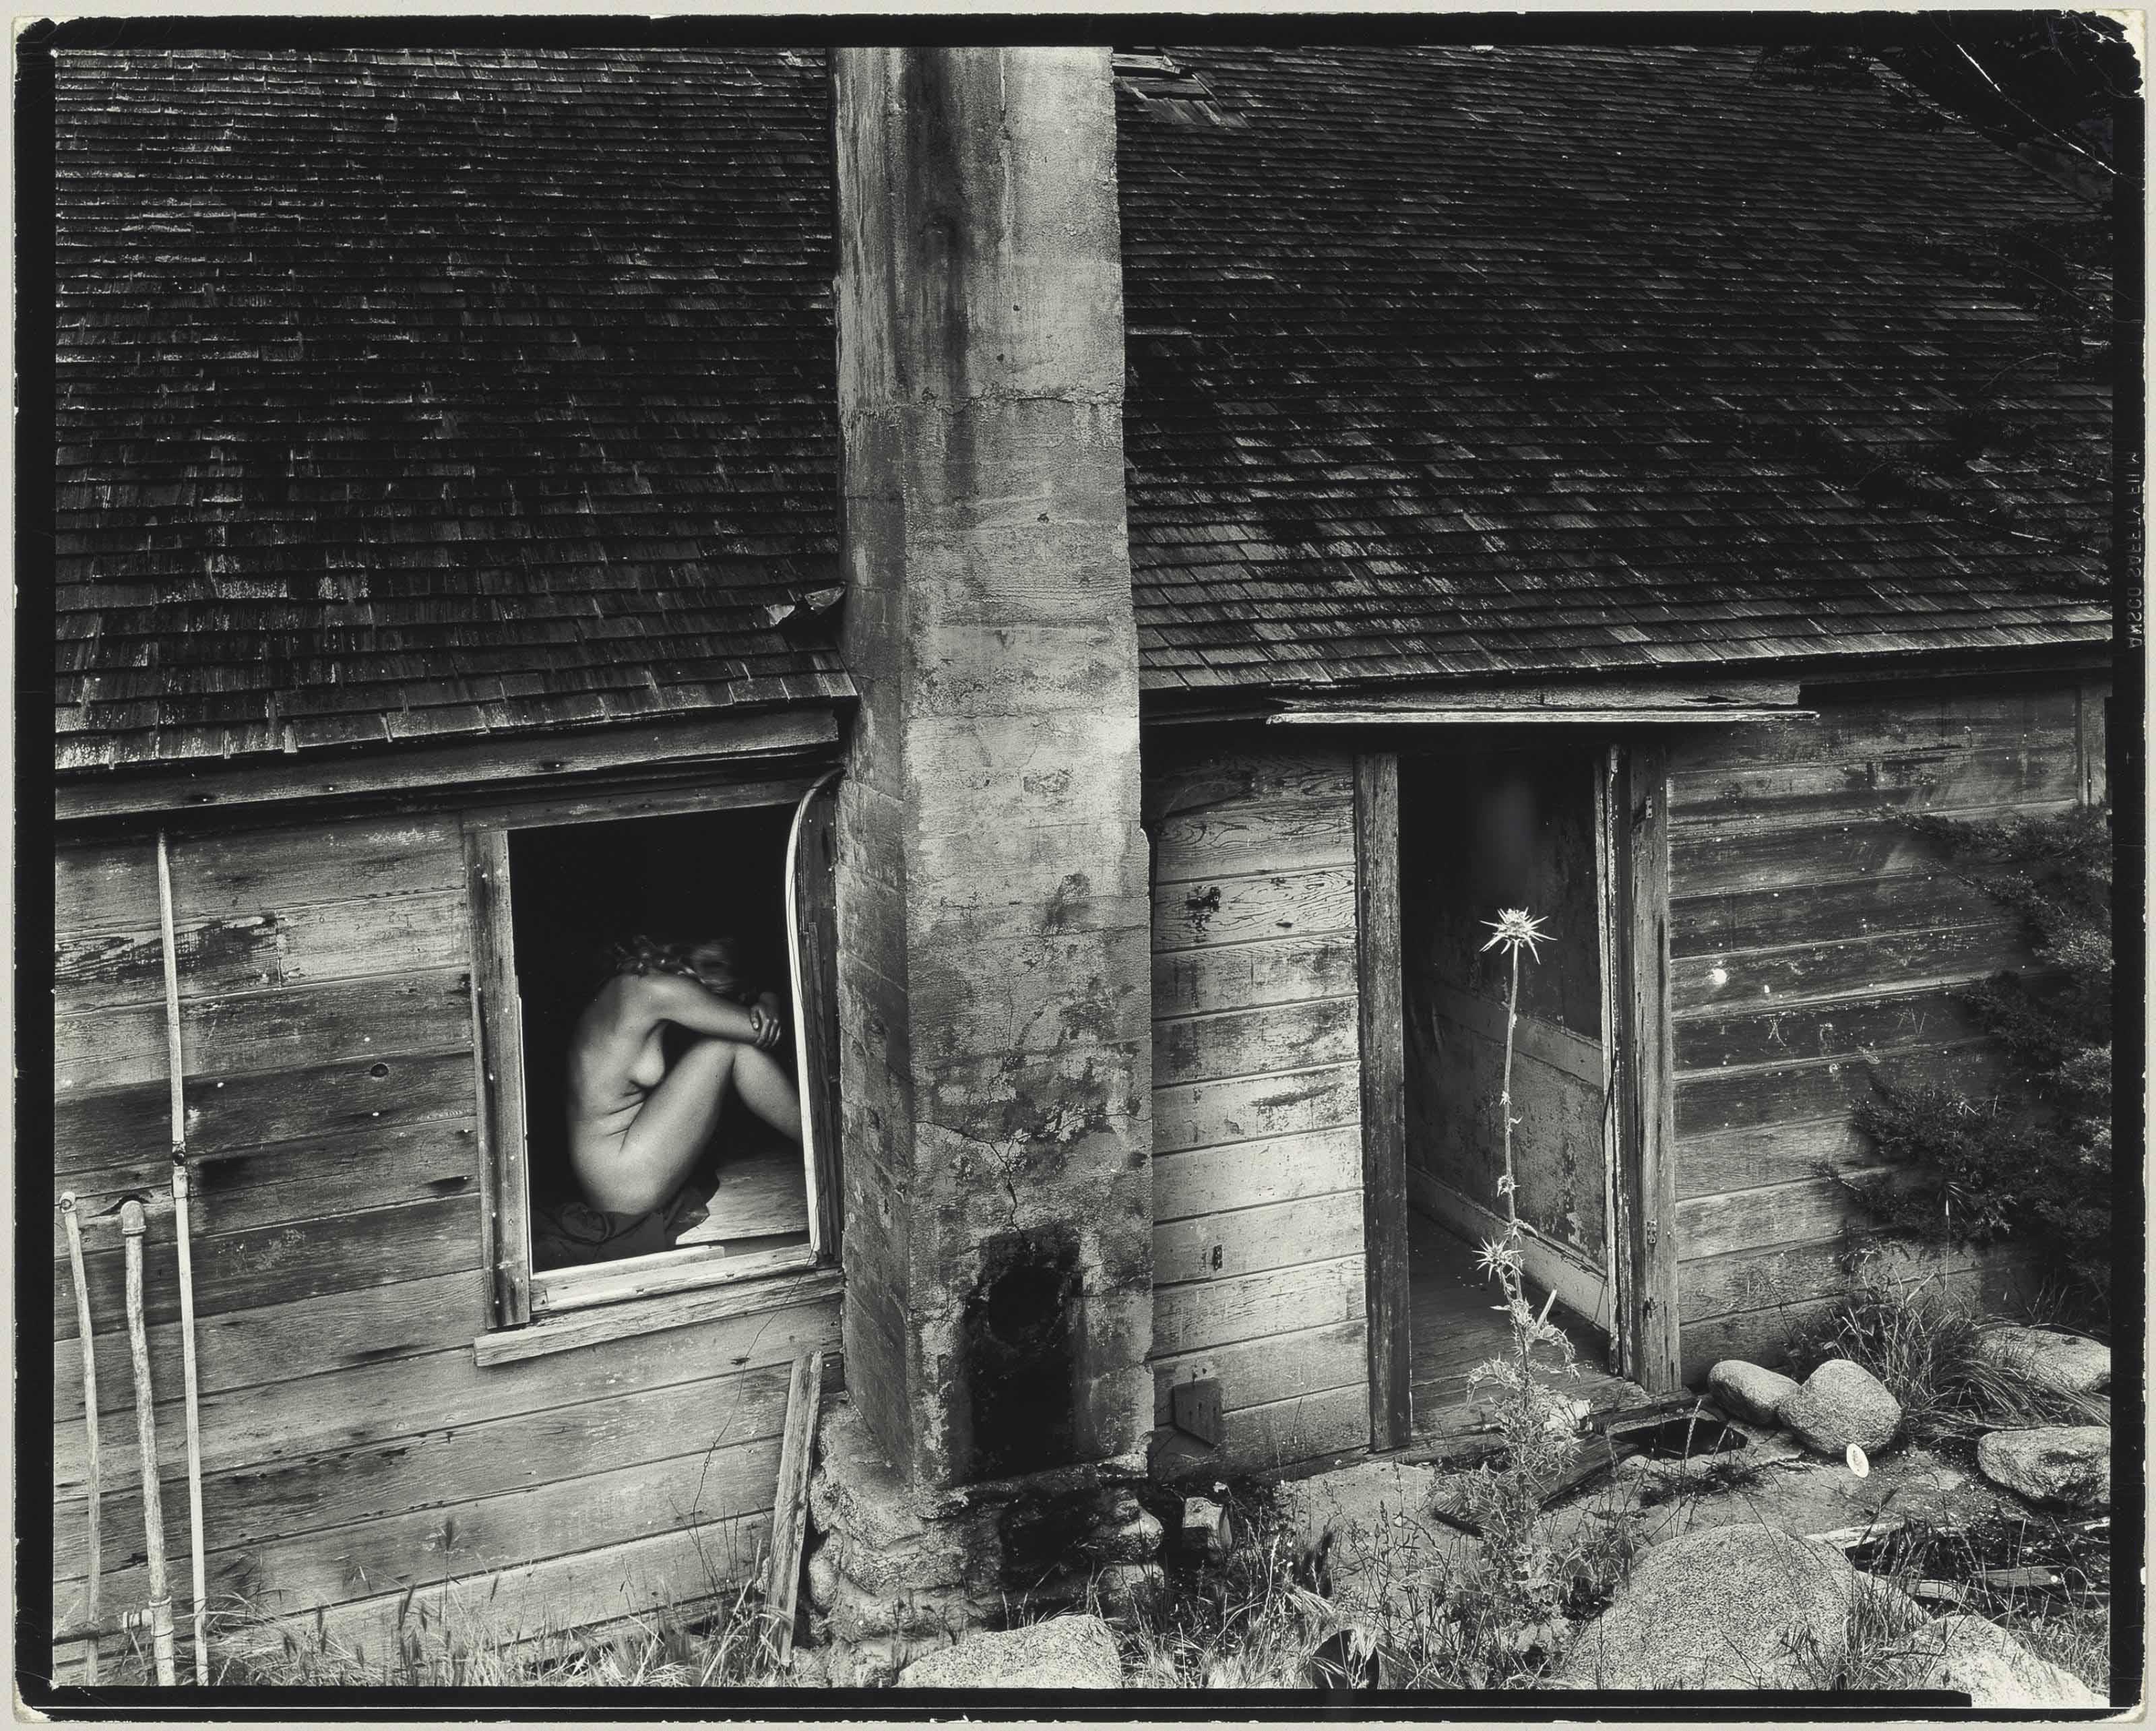 Nude in Window, c. 1955